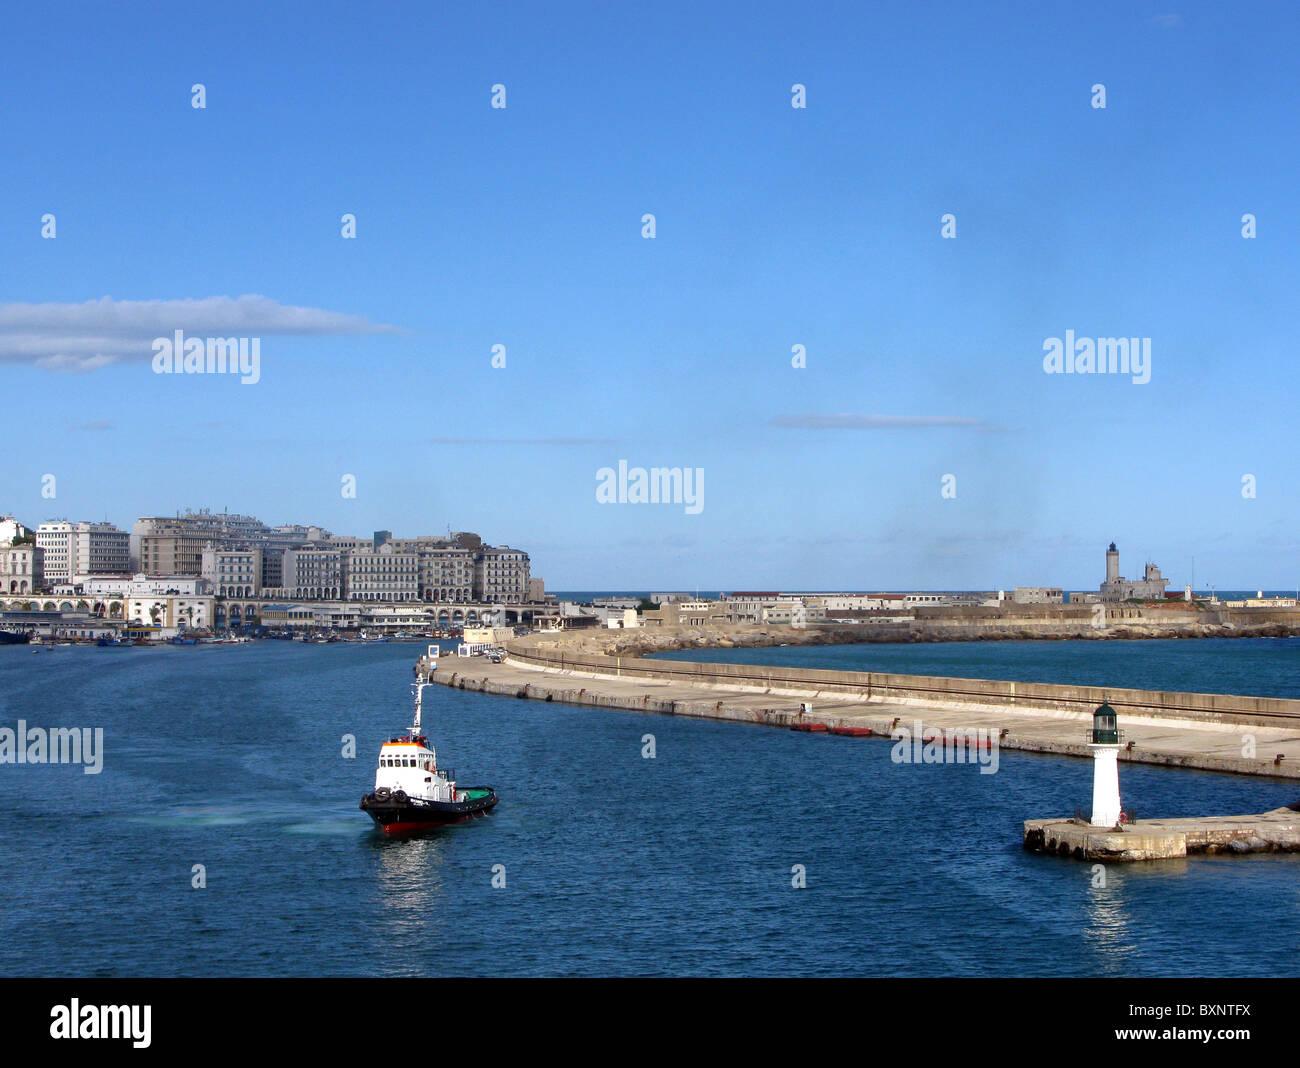 Algeri, città di Algeri in Algeria, Nord Africa Immagini Stock